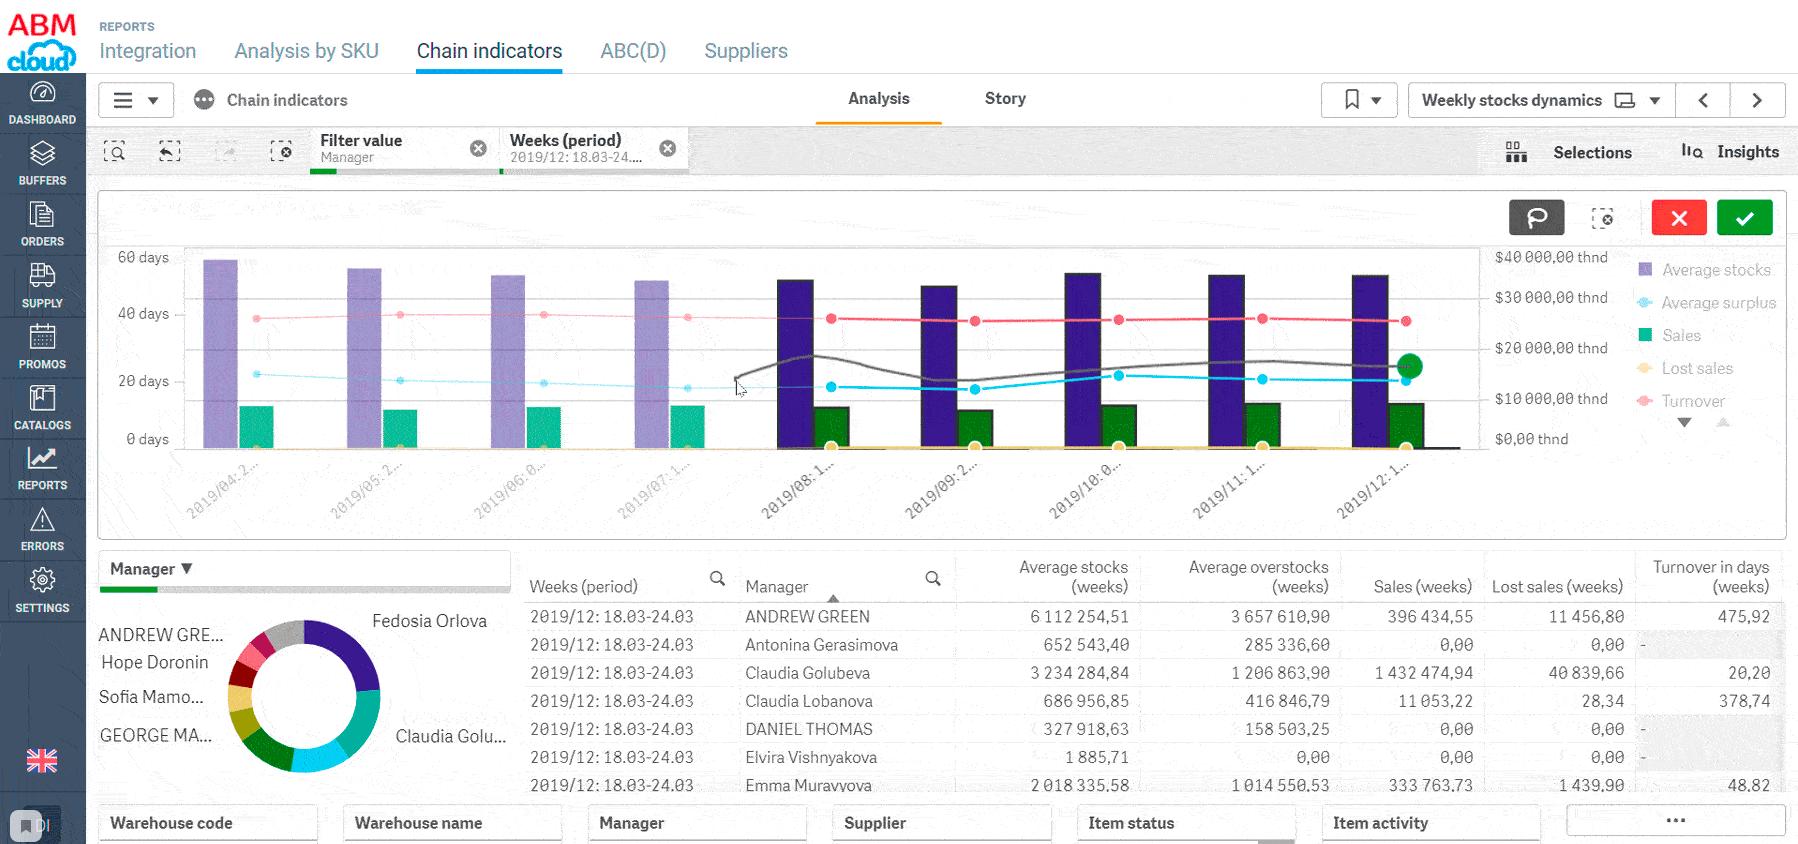 Анализ цепочки поставок в SCM-системе ABM Inventory